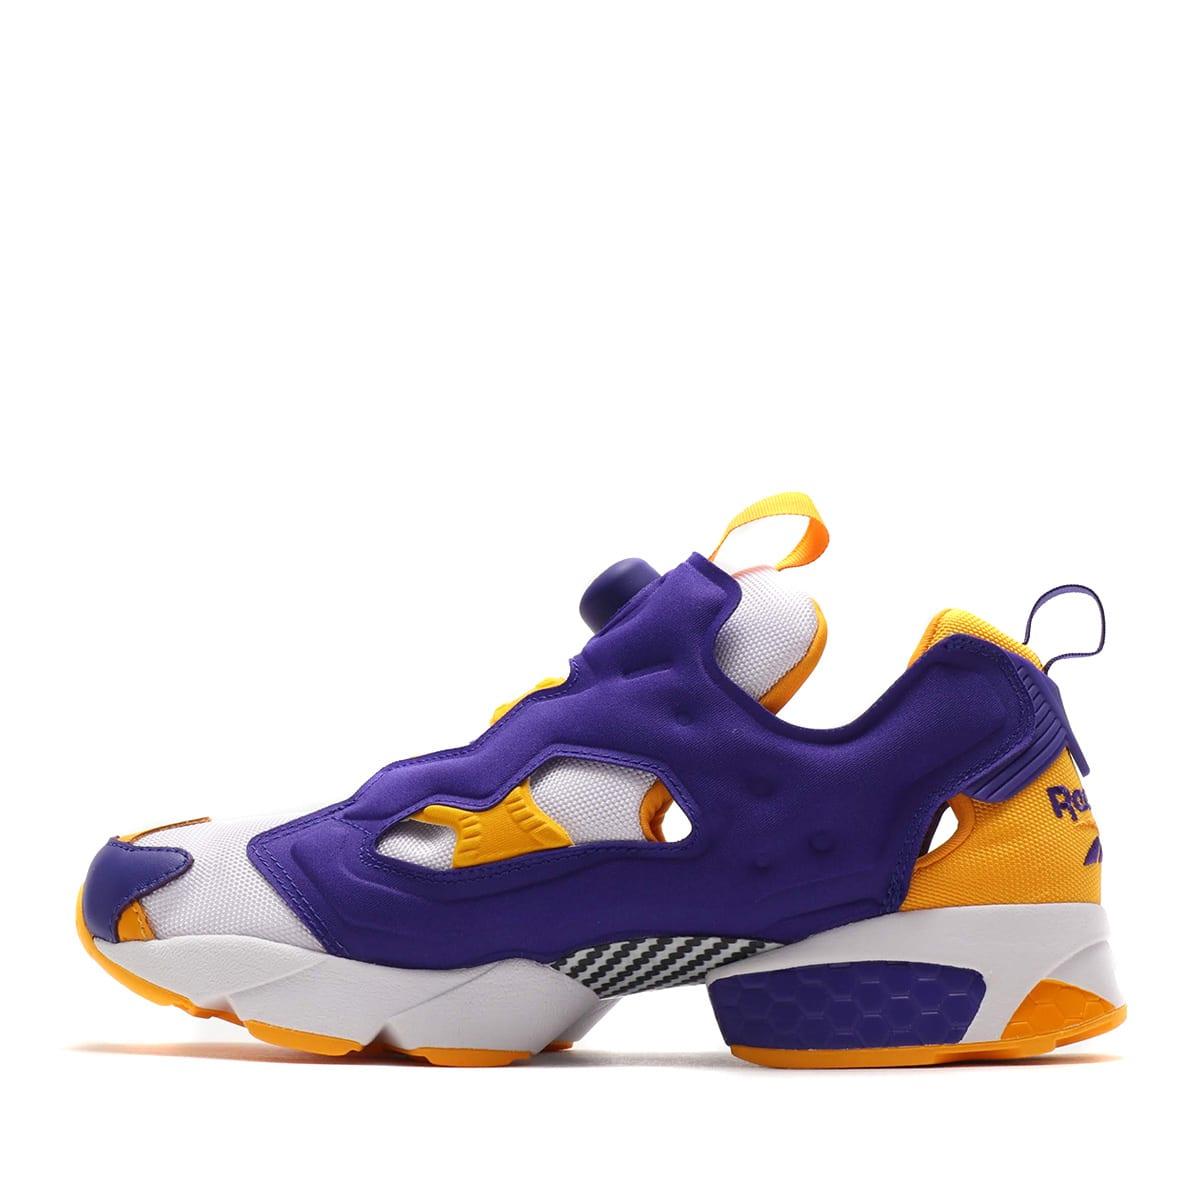 Reebok Insta Pump Fury OG MU White Purple Yellow Men Running Shoe Sneaker DV8291